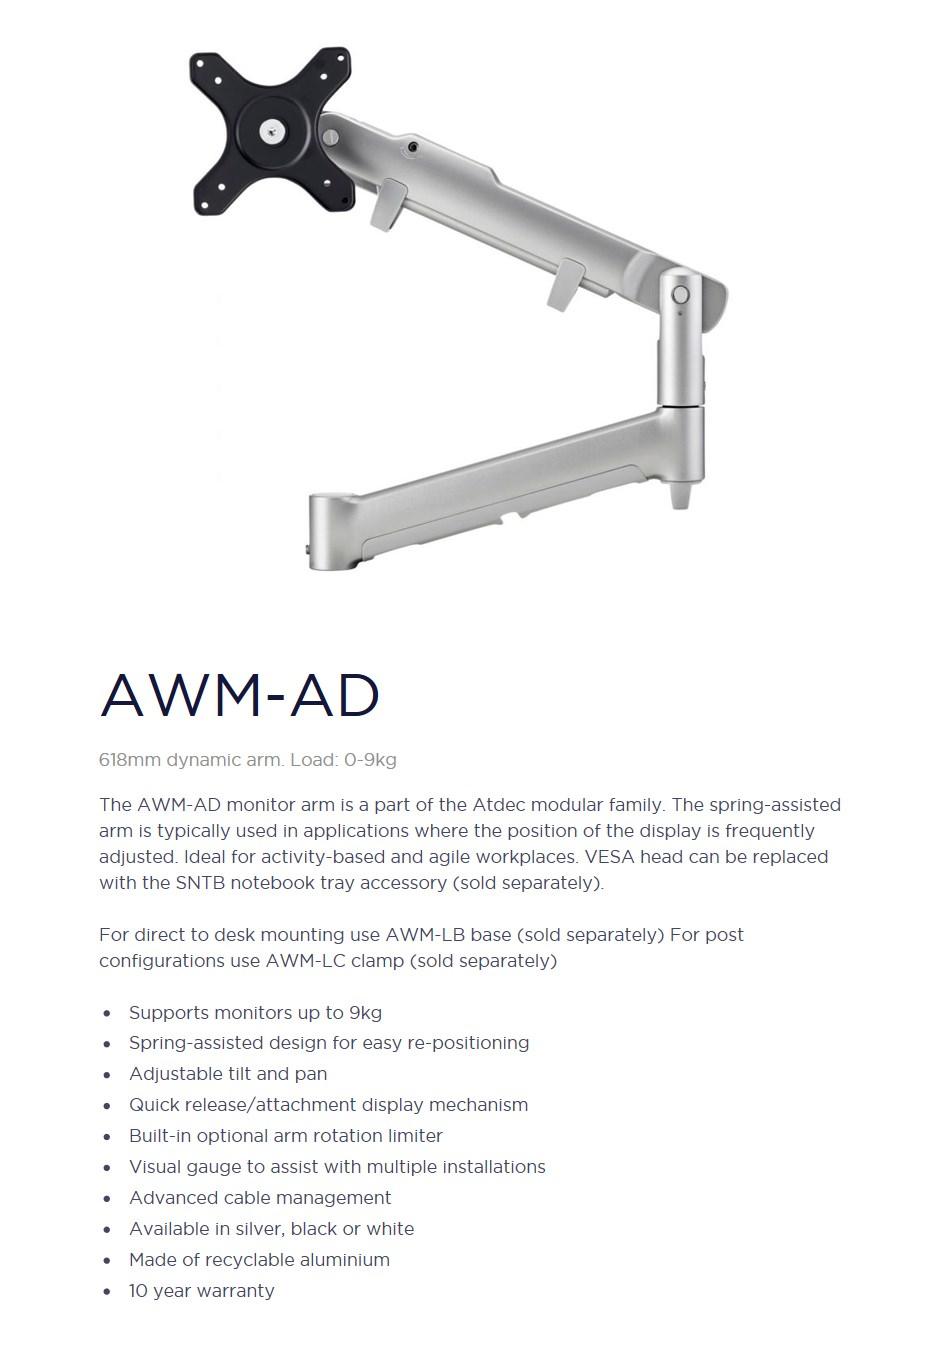 Atdec AWM-AD 618mm Dynamic Monitor Arm - Silver - Desktop Overview 1